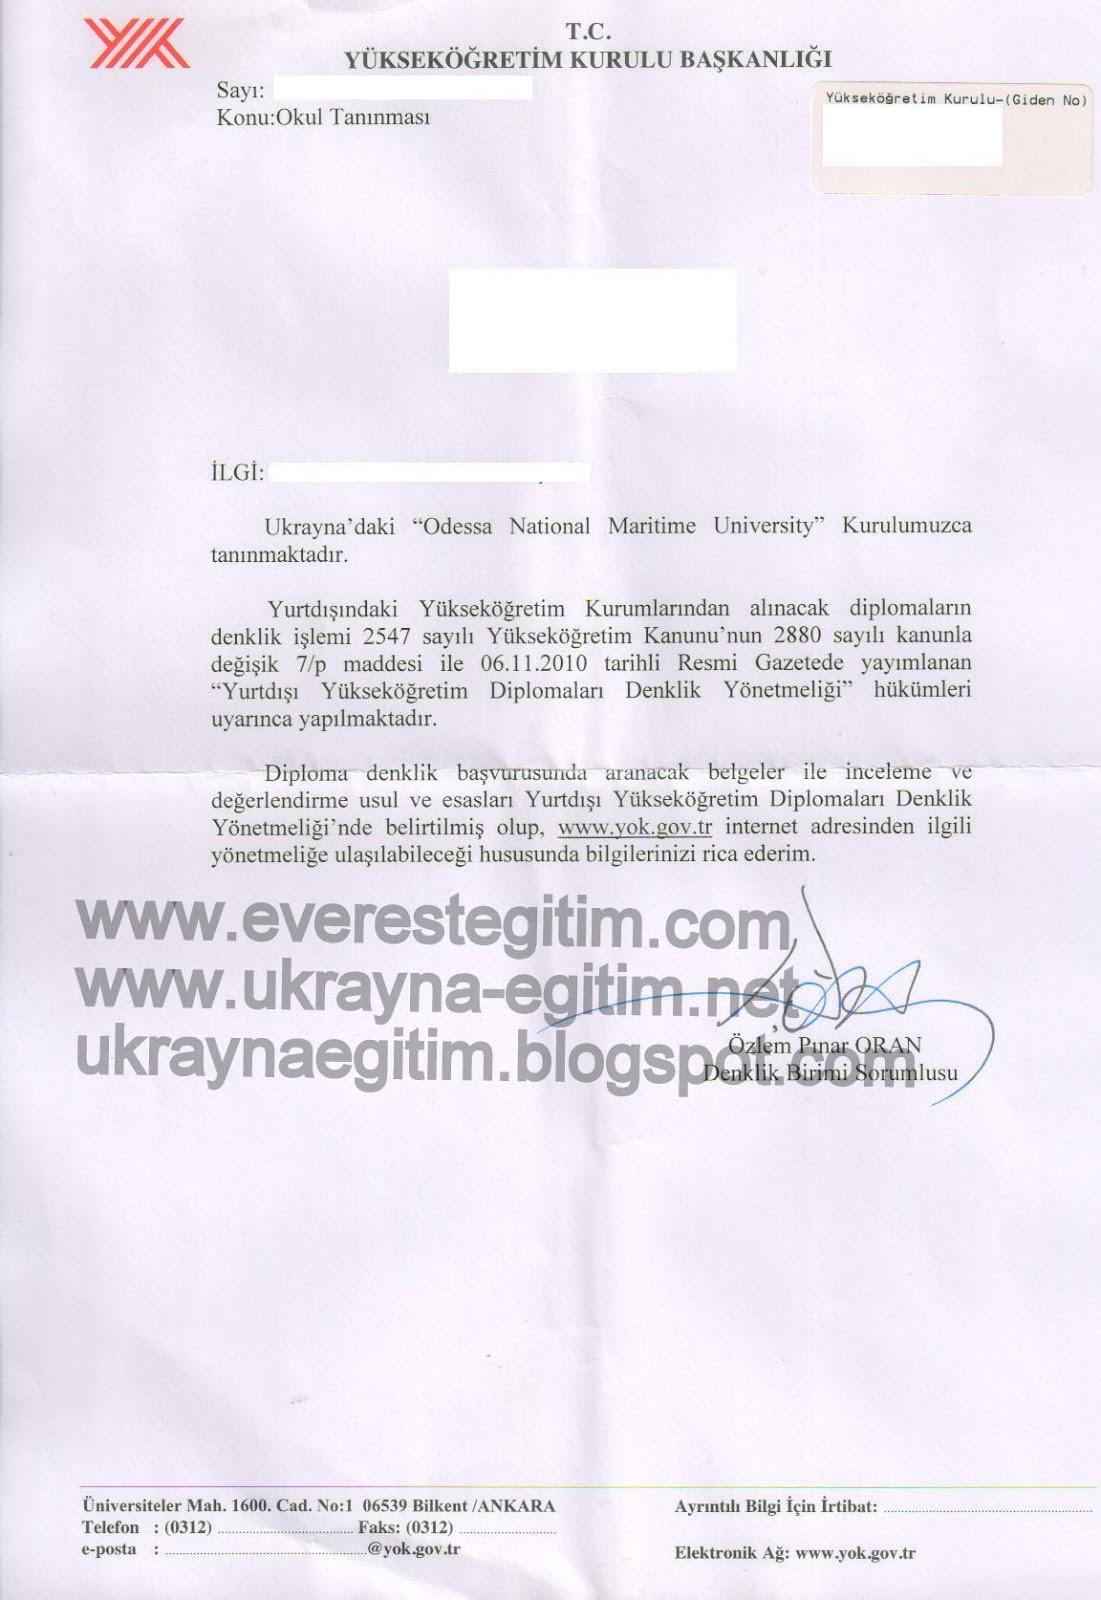 Ukraynaya pasaport vermem gerekiyor mu Ve pasaport nerede